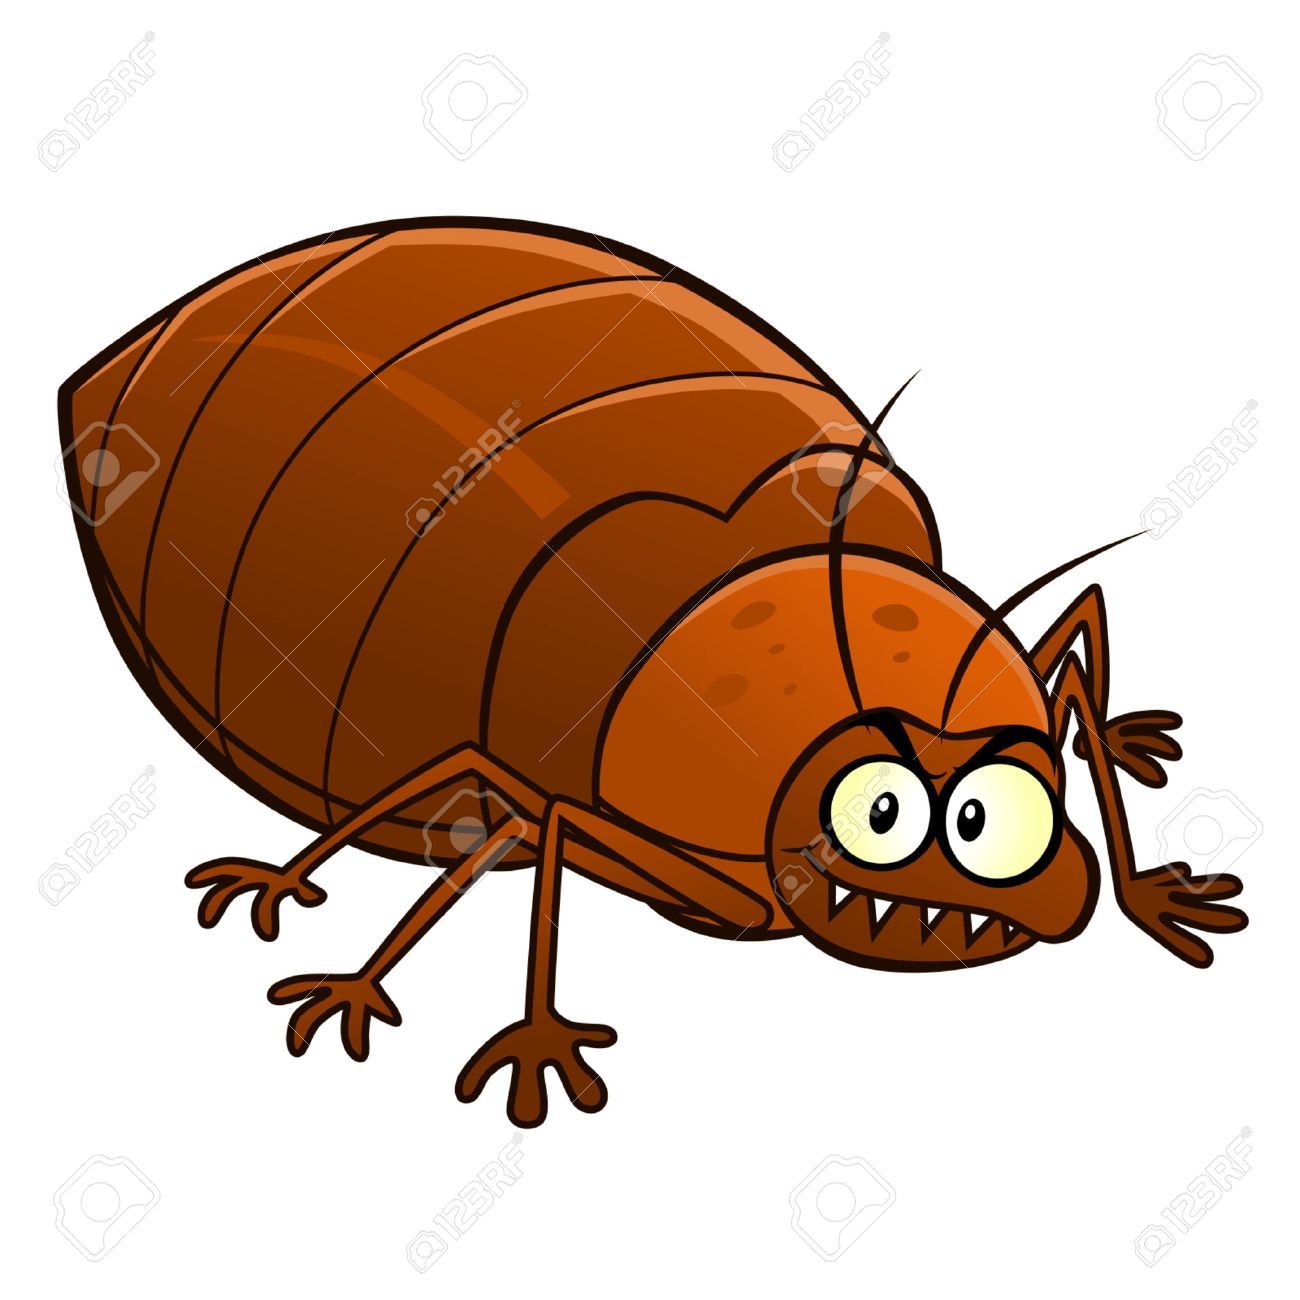 Cartoon smiling bedbug - 37696152